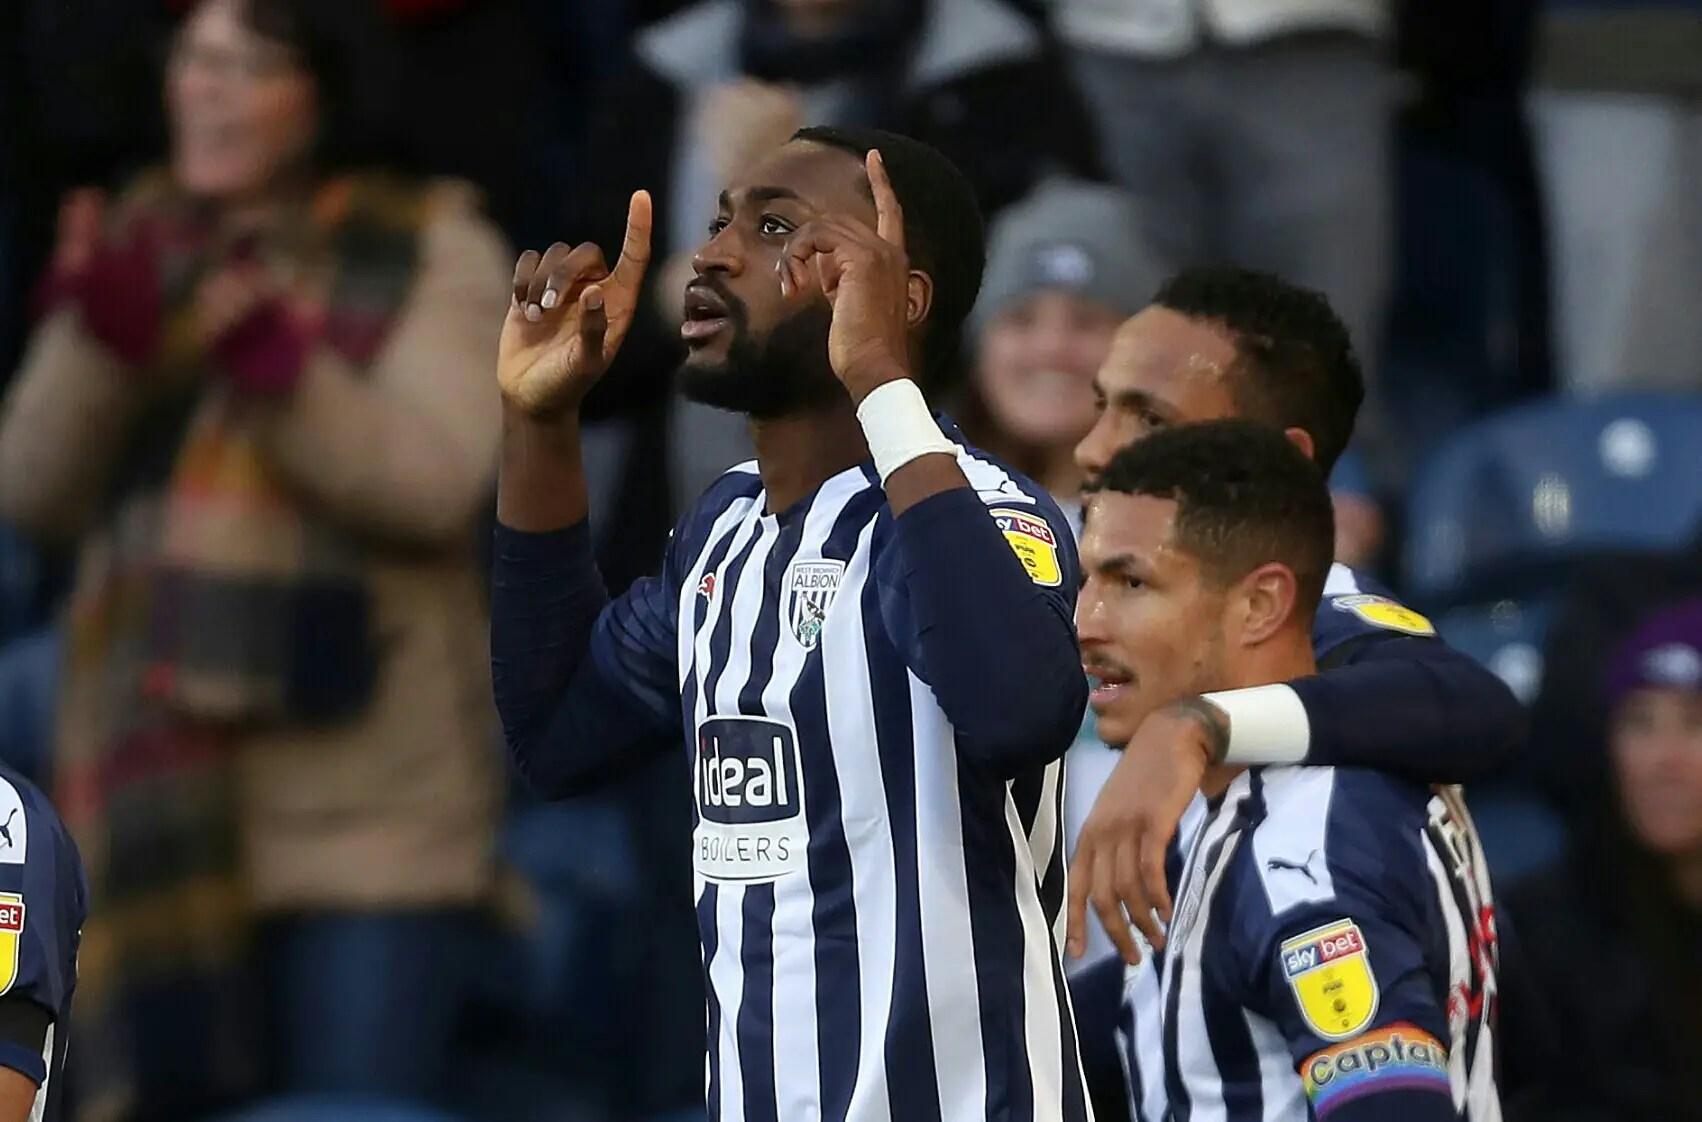 Ajayi's West Brom To Face Aston Villa In Friendly Ahead English Football Return